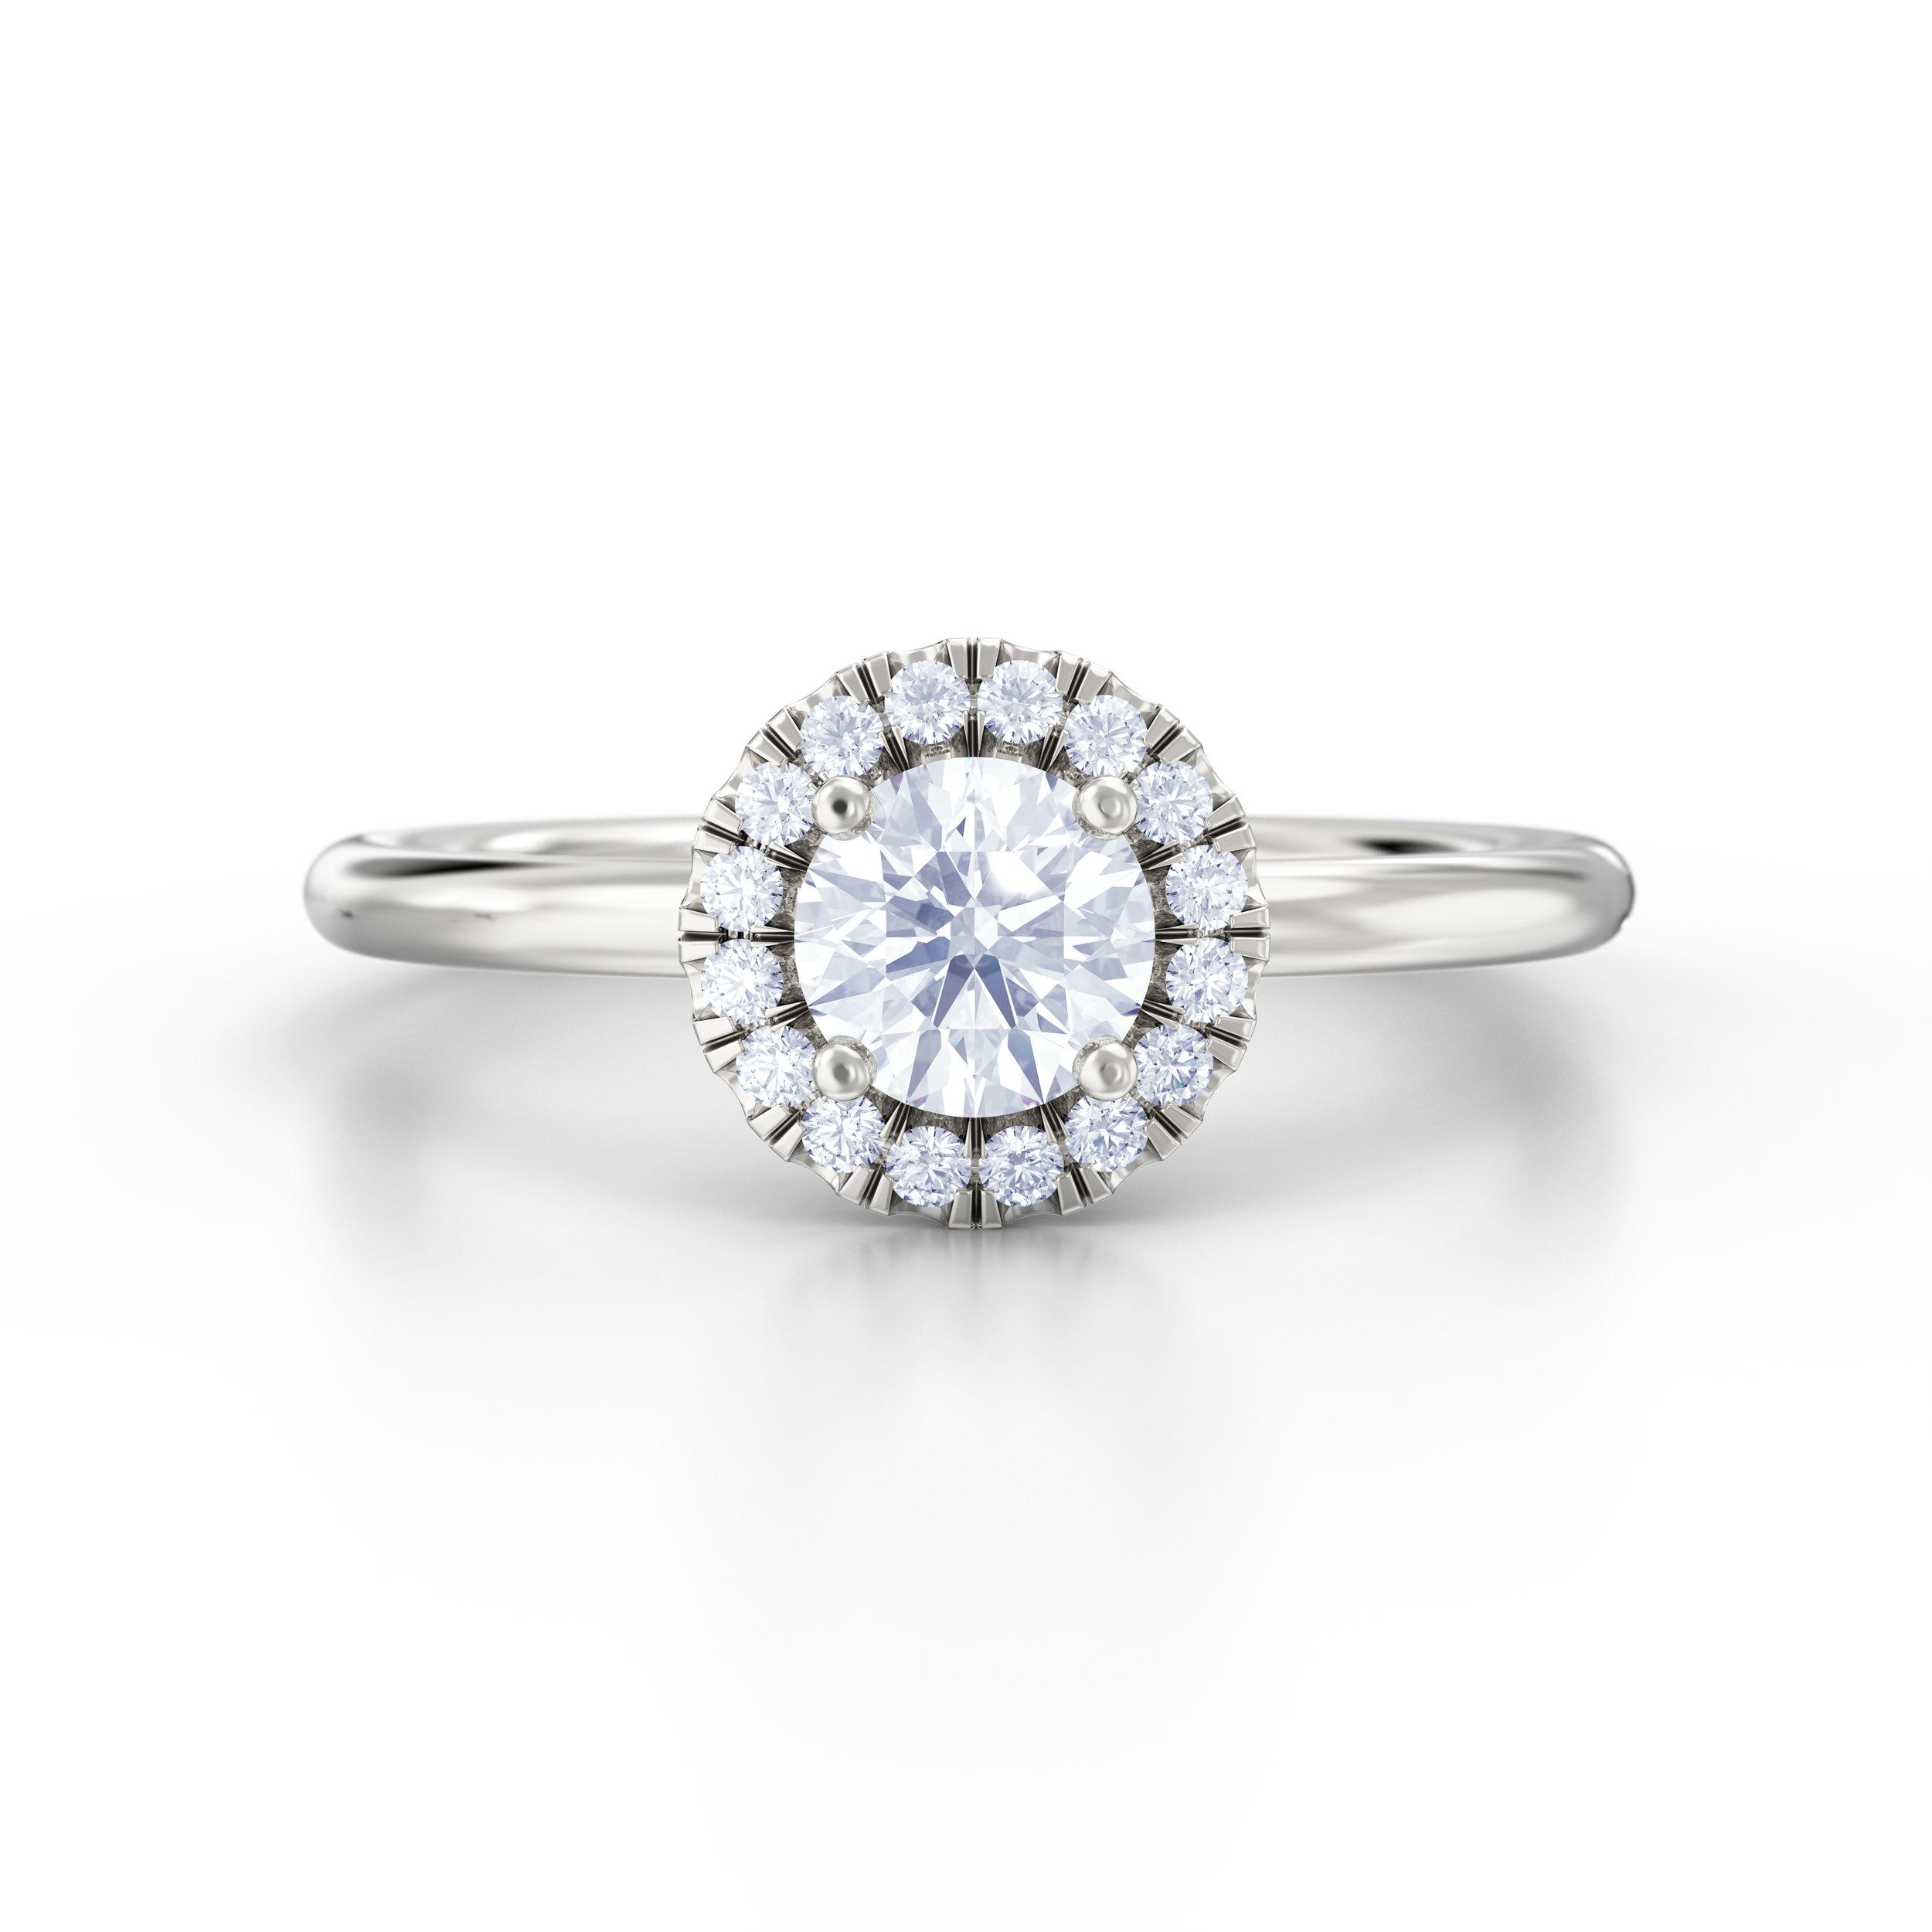 Diamond Halo Engagement Rings | Hatton Garden Jewellers